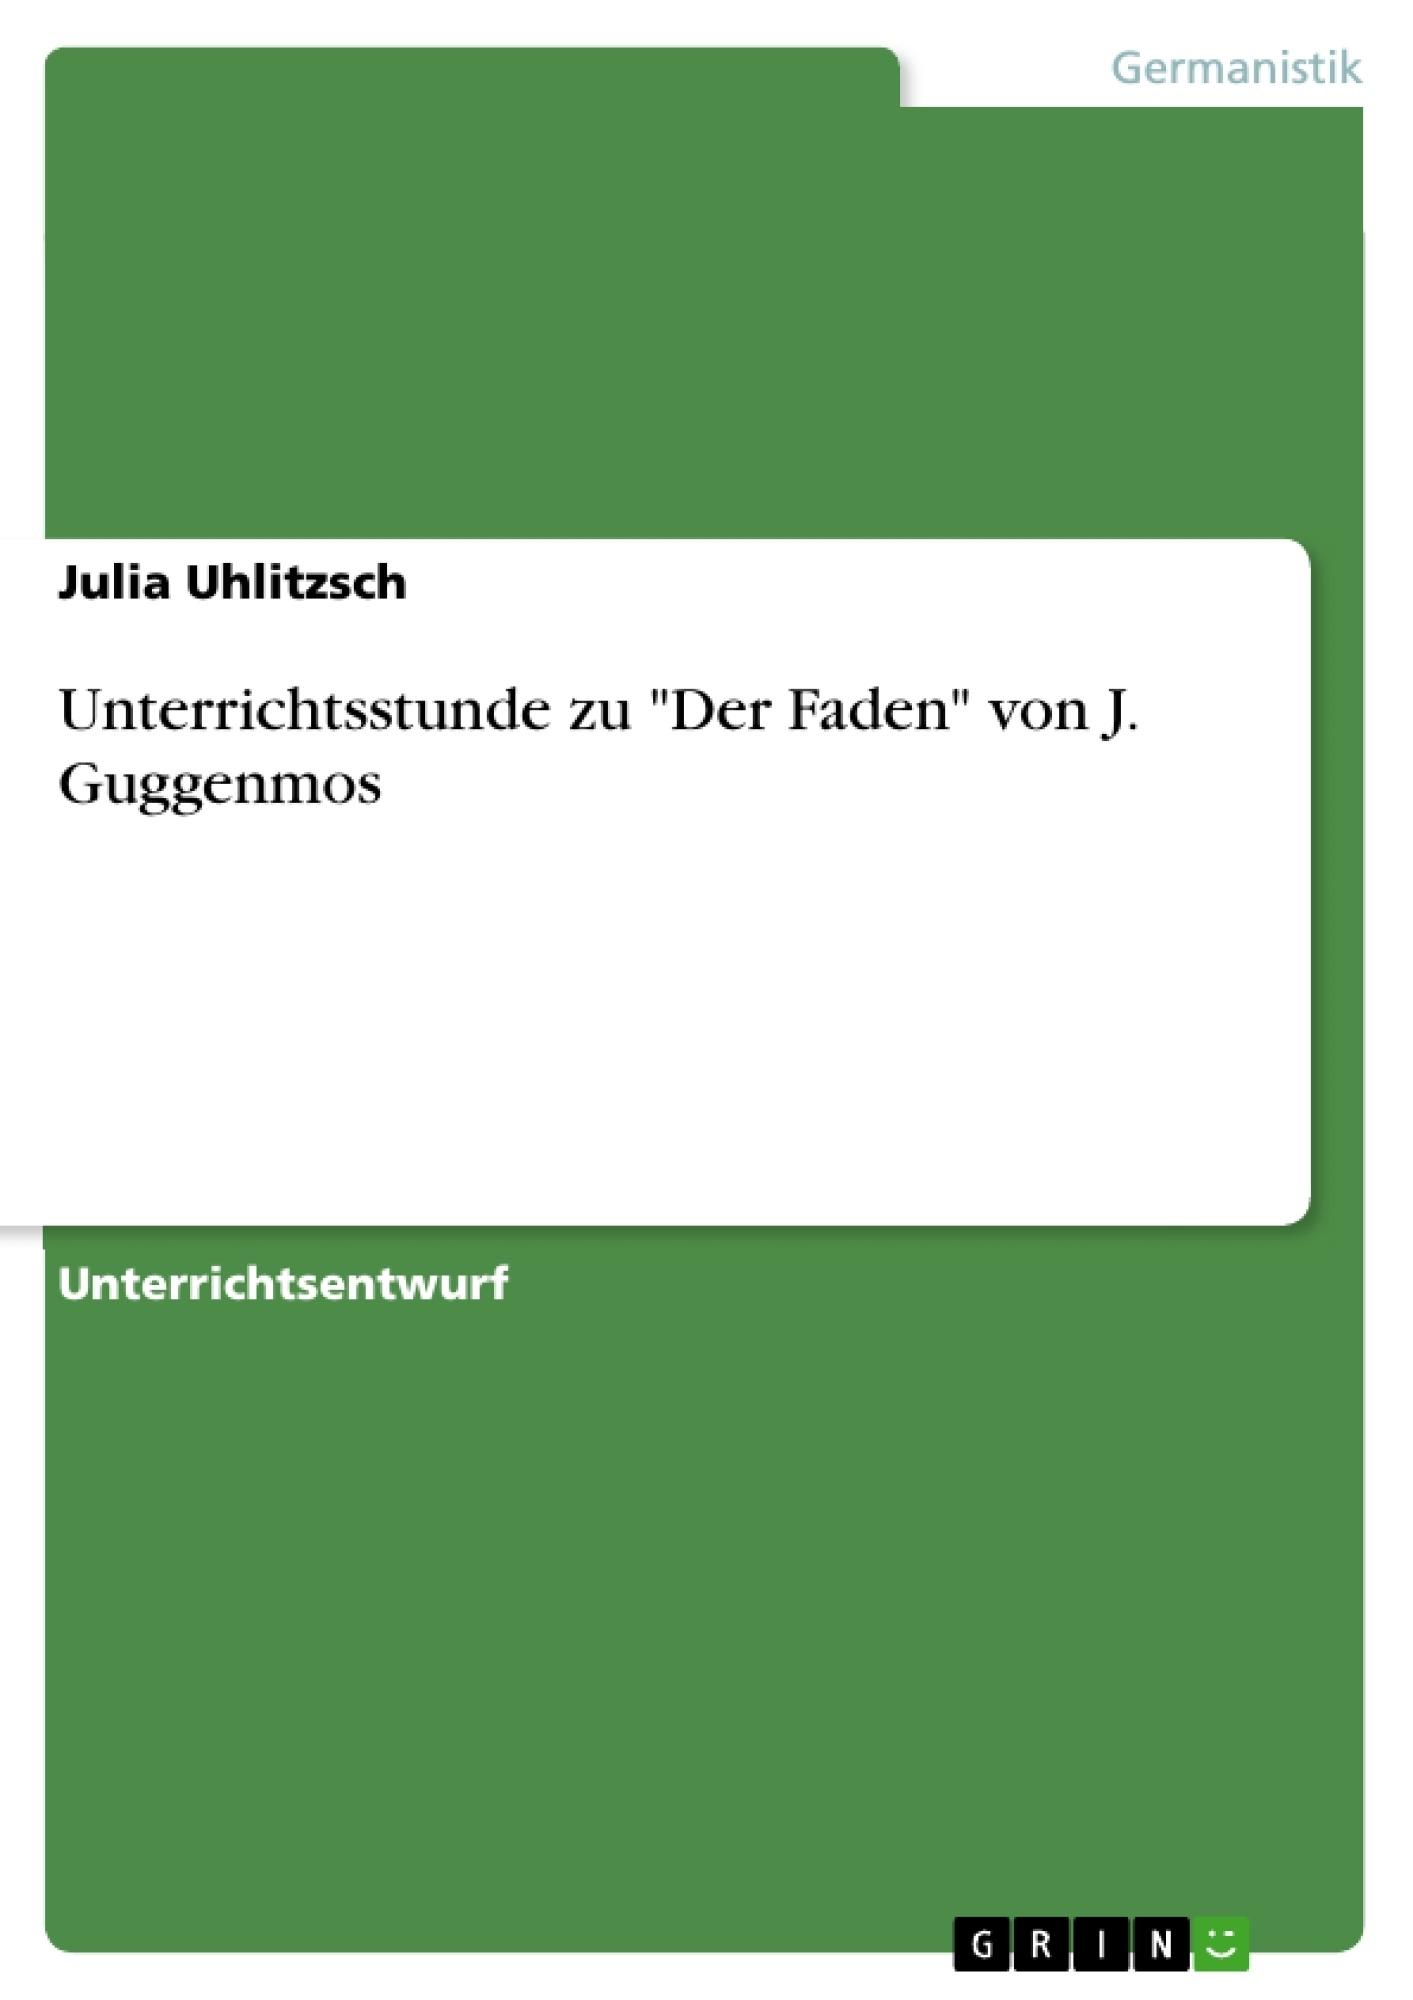 book Nitrattherapie heute: Die